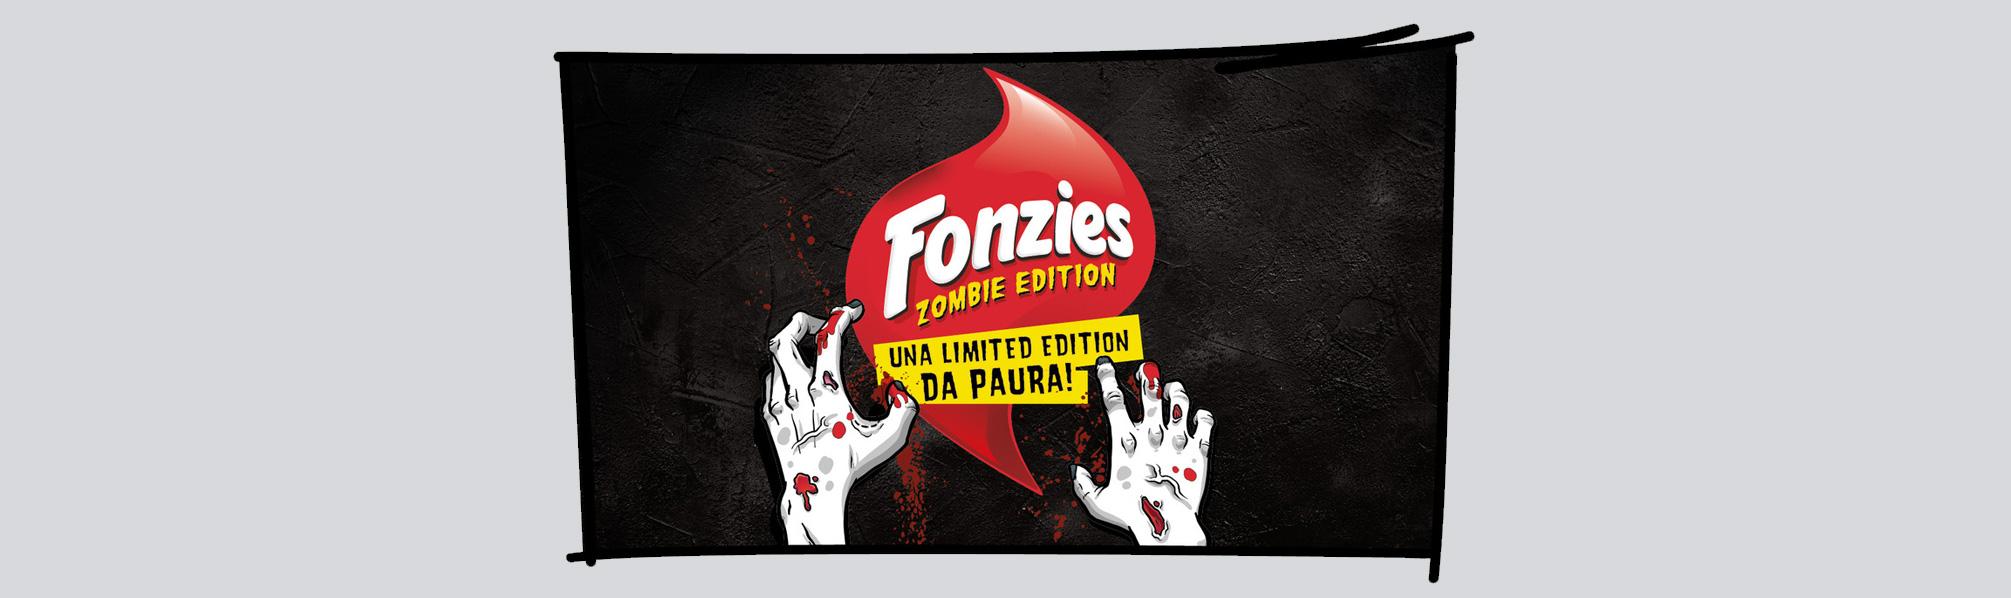 Fonzies-banner.jpg